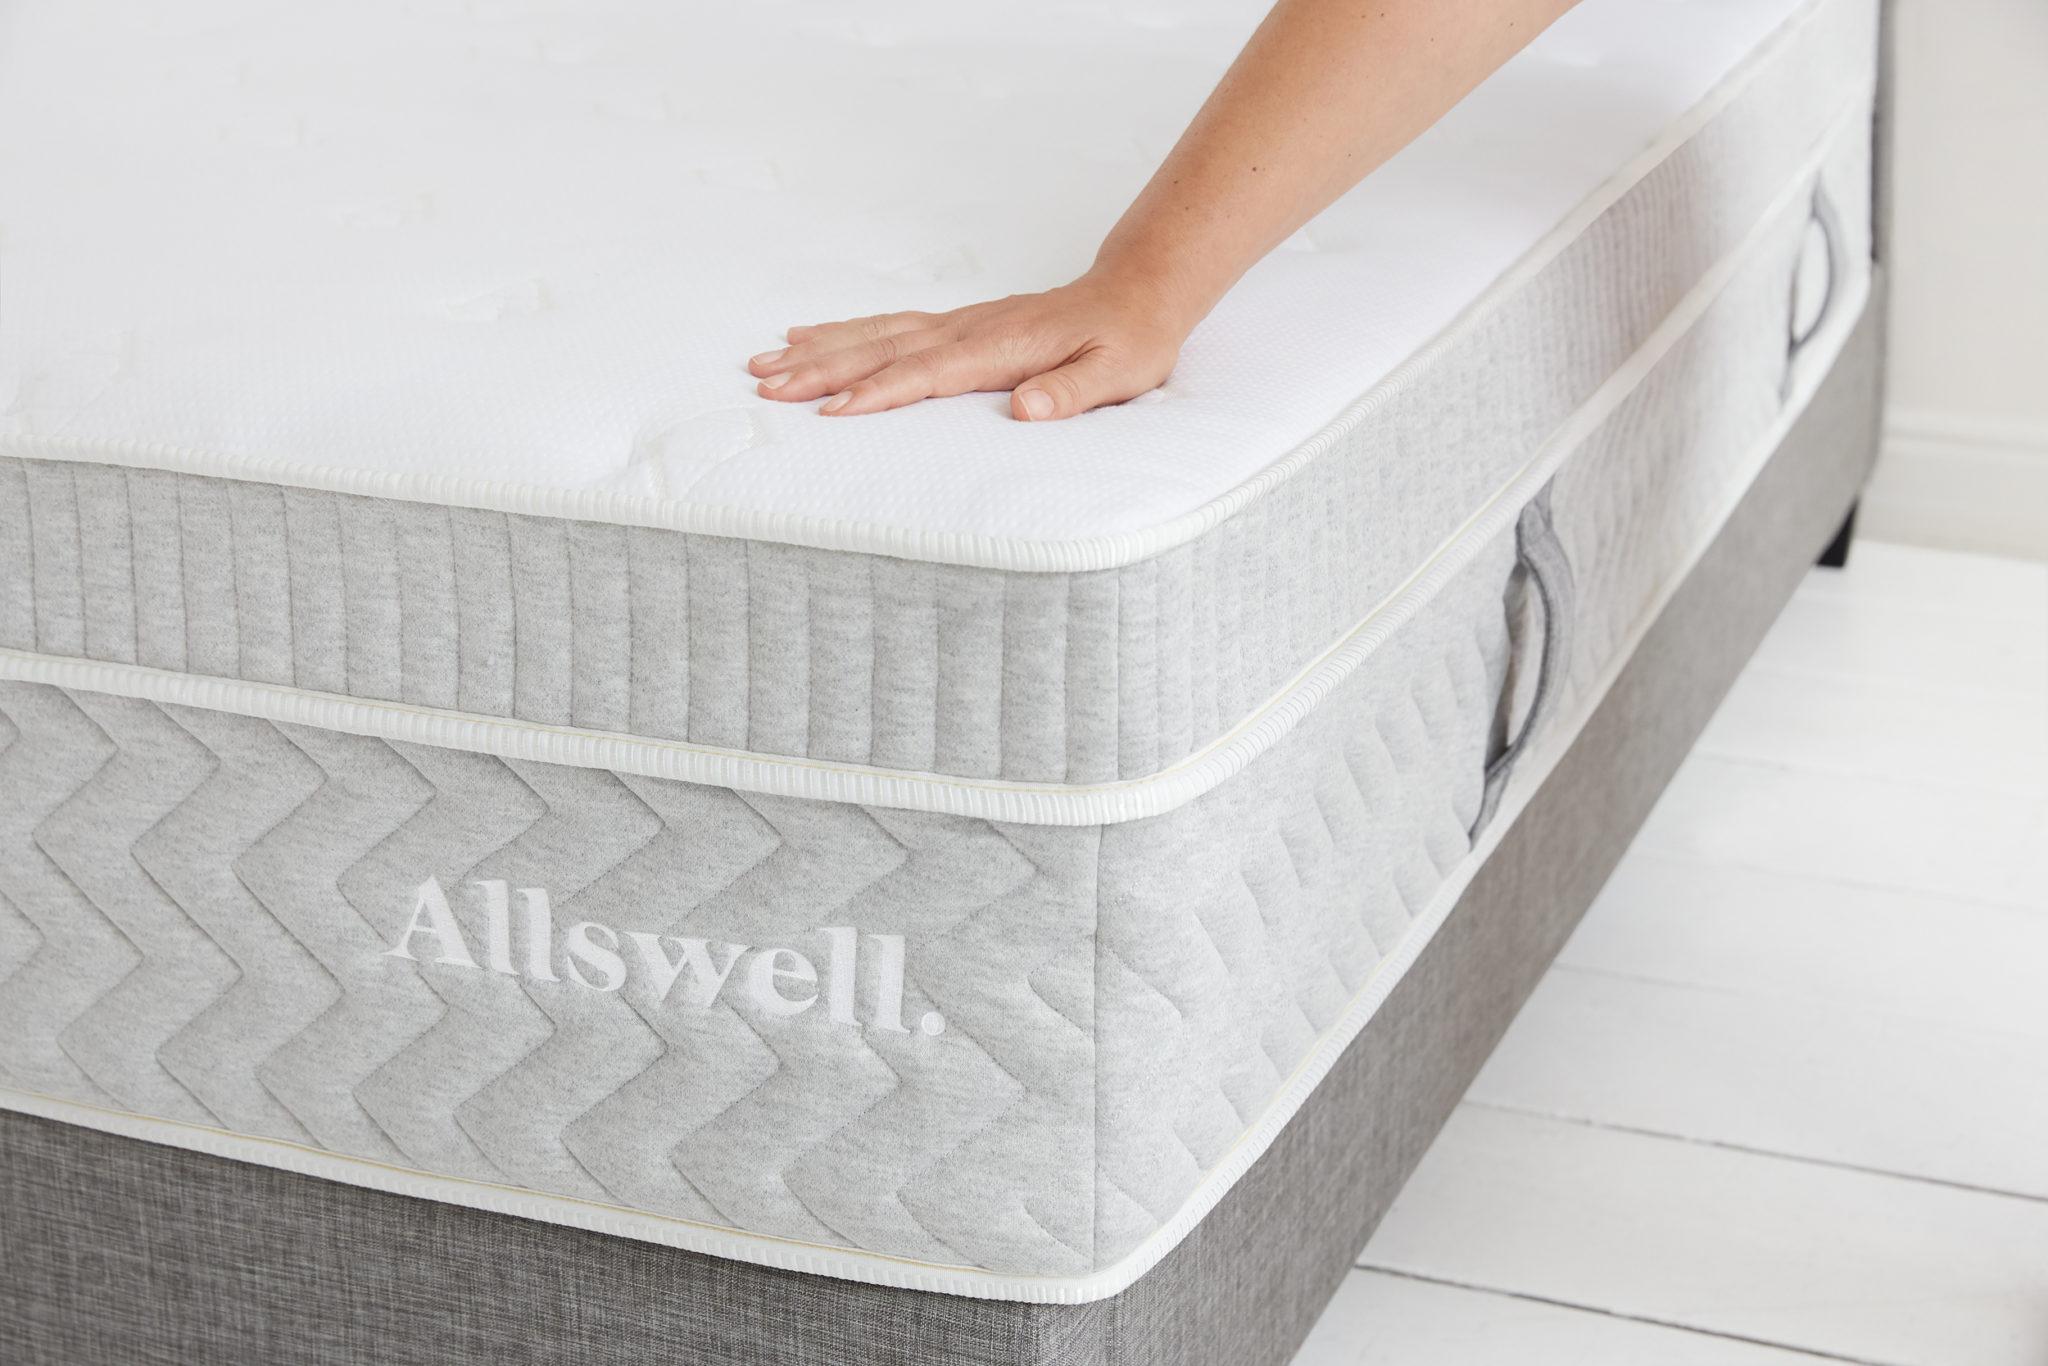 allswell supreme mattress side